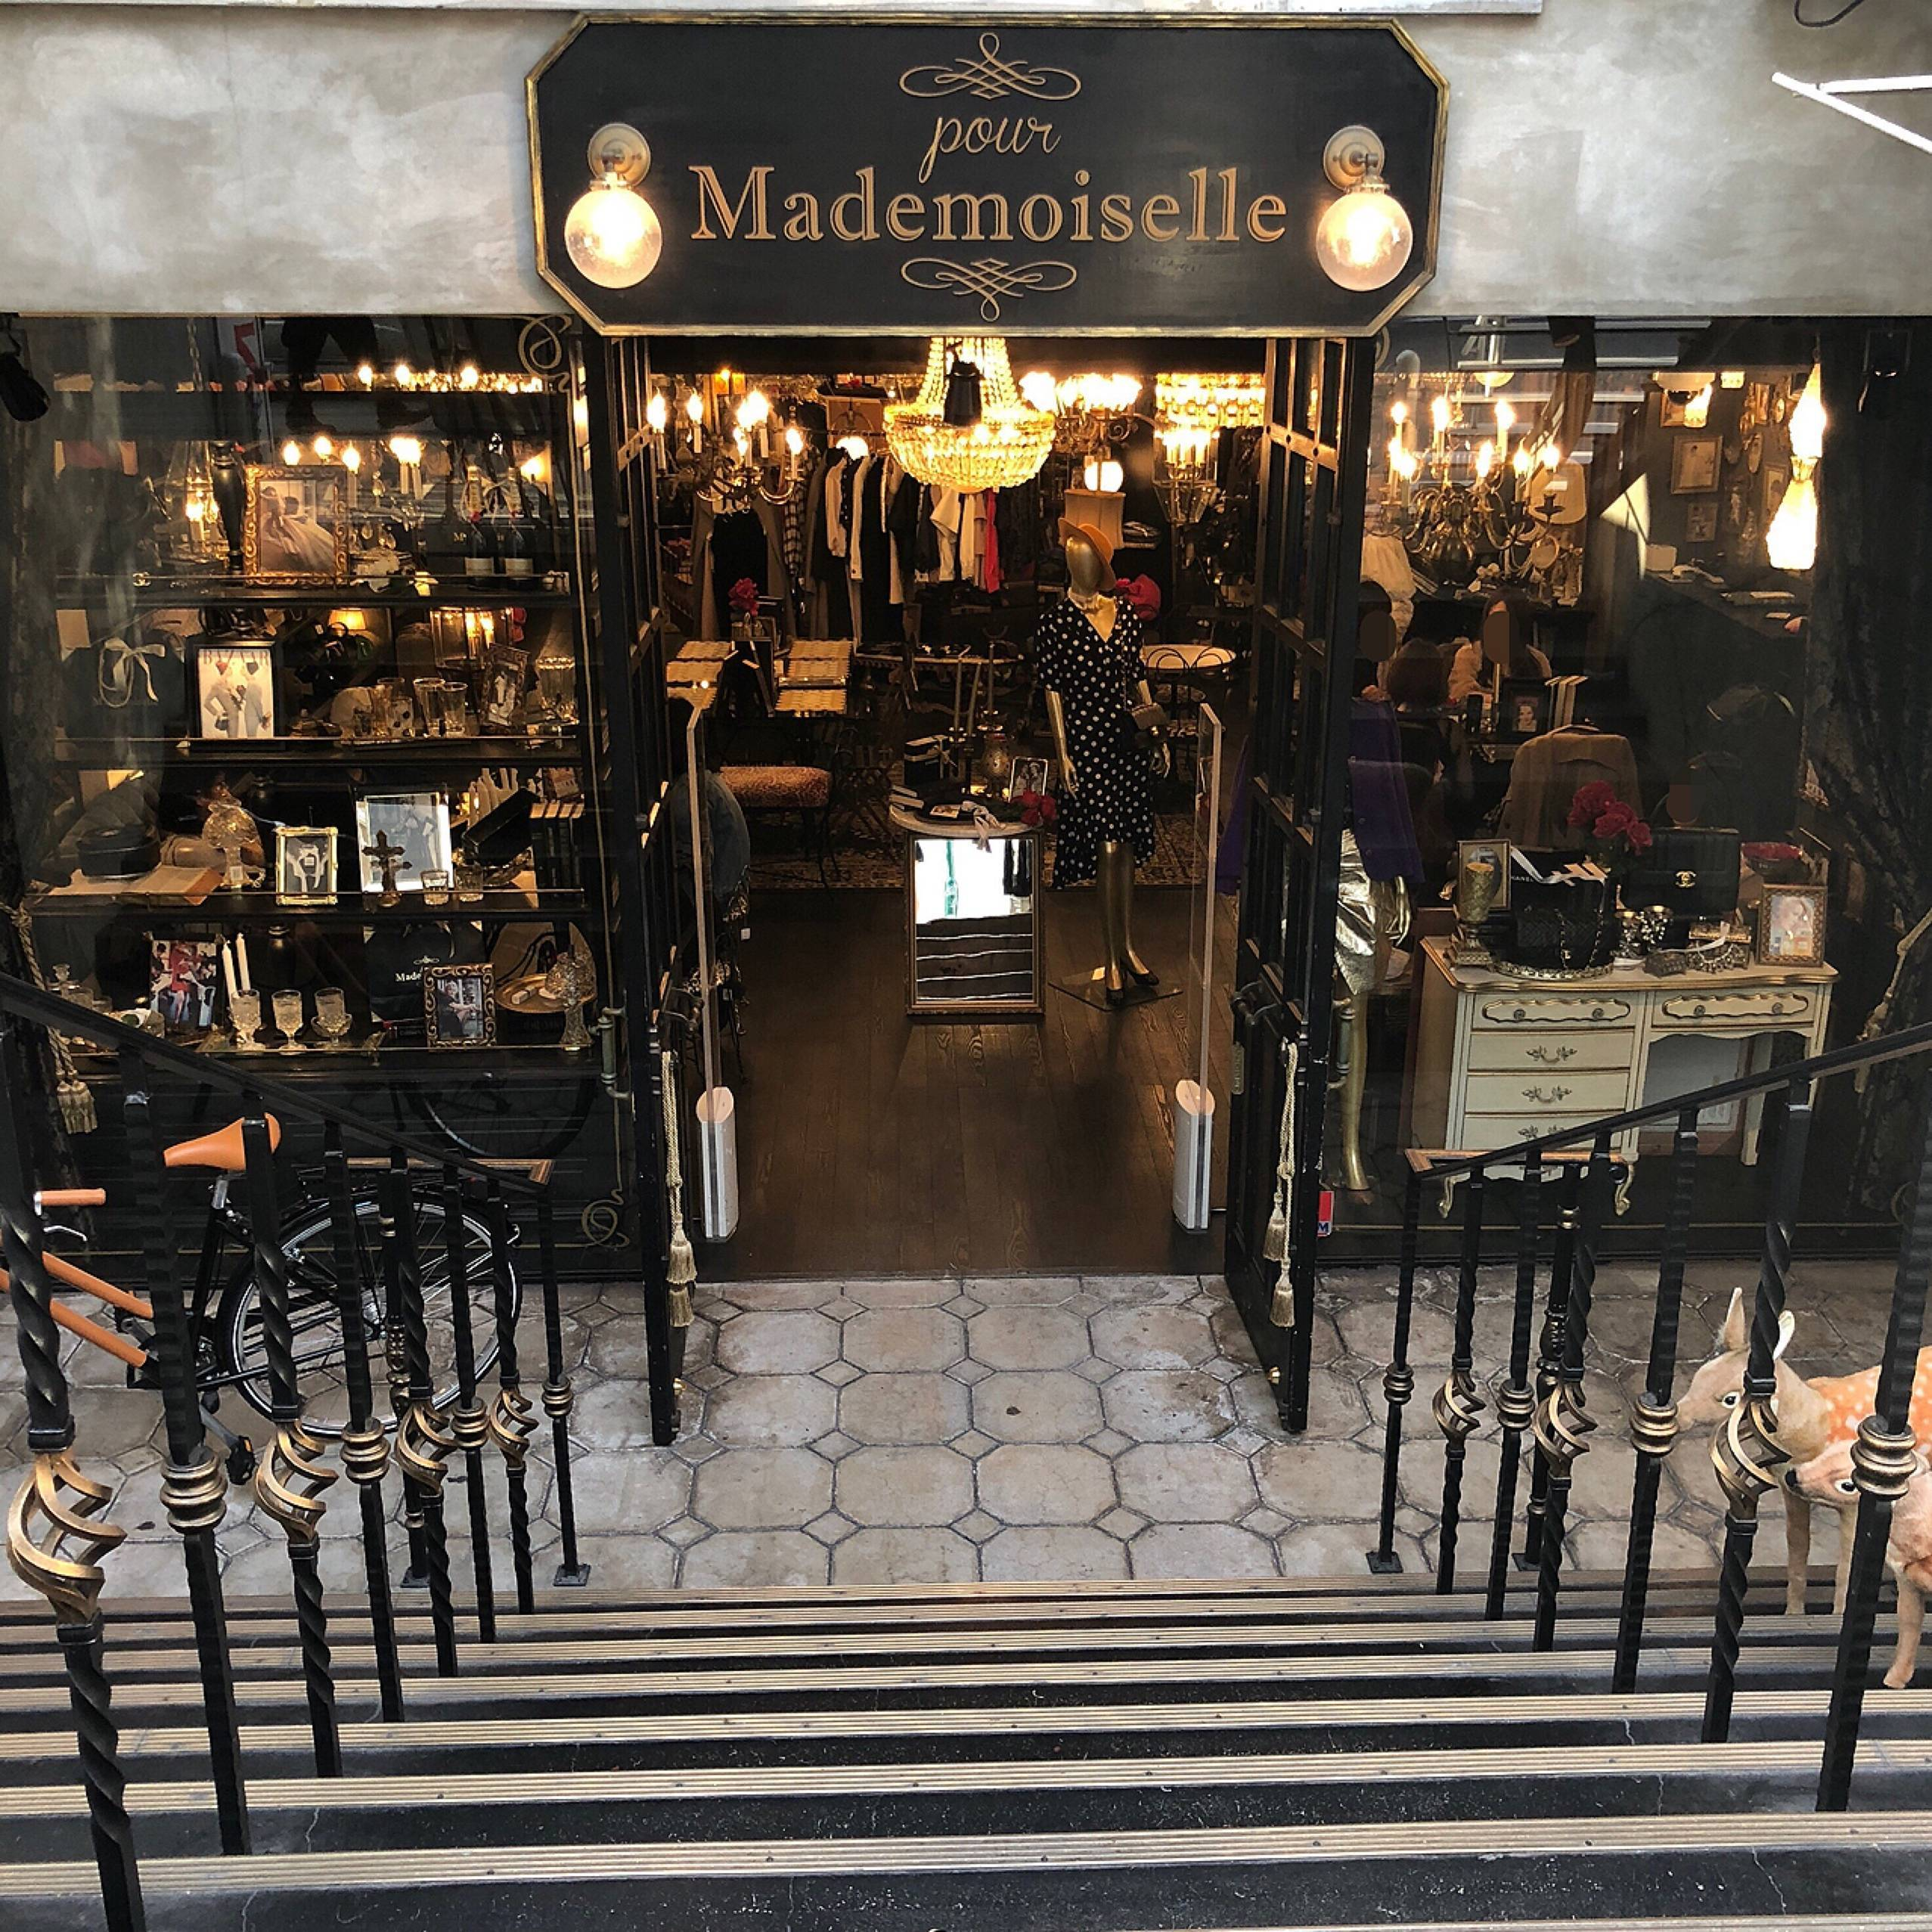 Vol.46♡ 大阪のカフェ巡りで困ったらここ!①【Mademoiselle CAFE(マドモワゼル カフェ)】_1_1